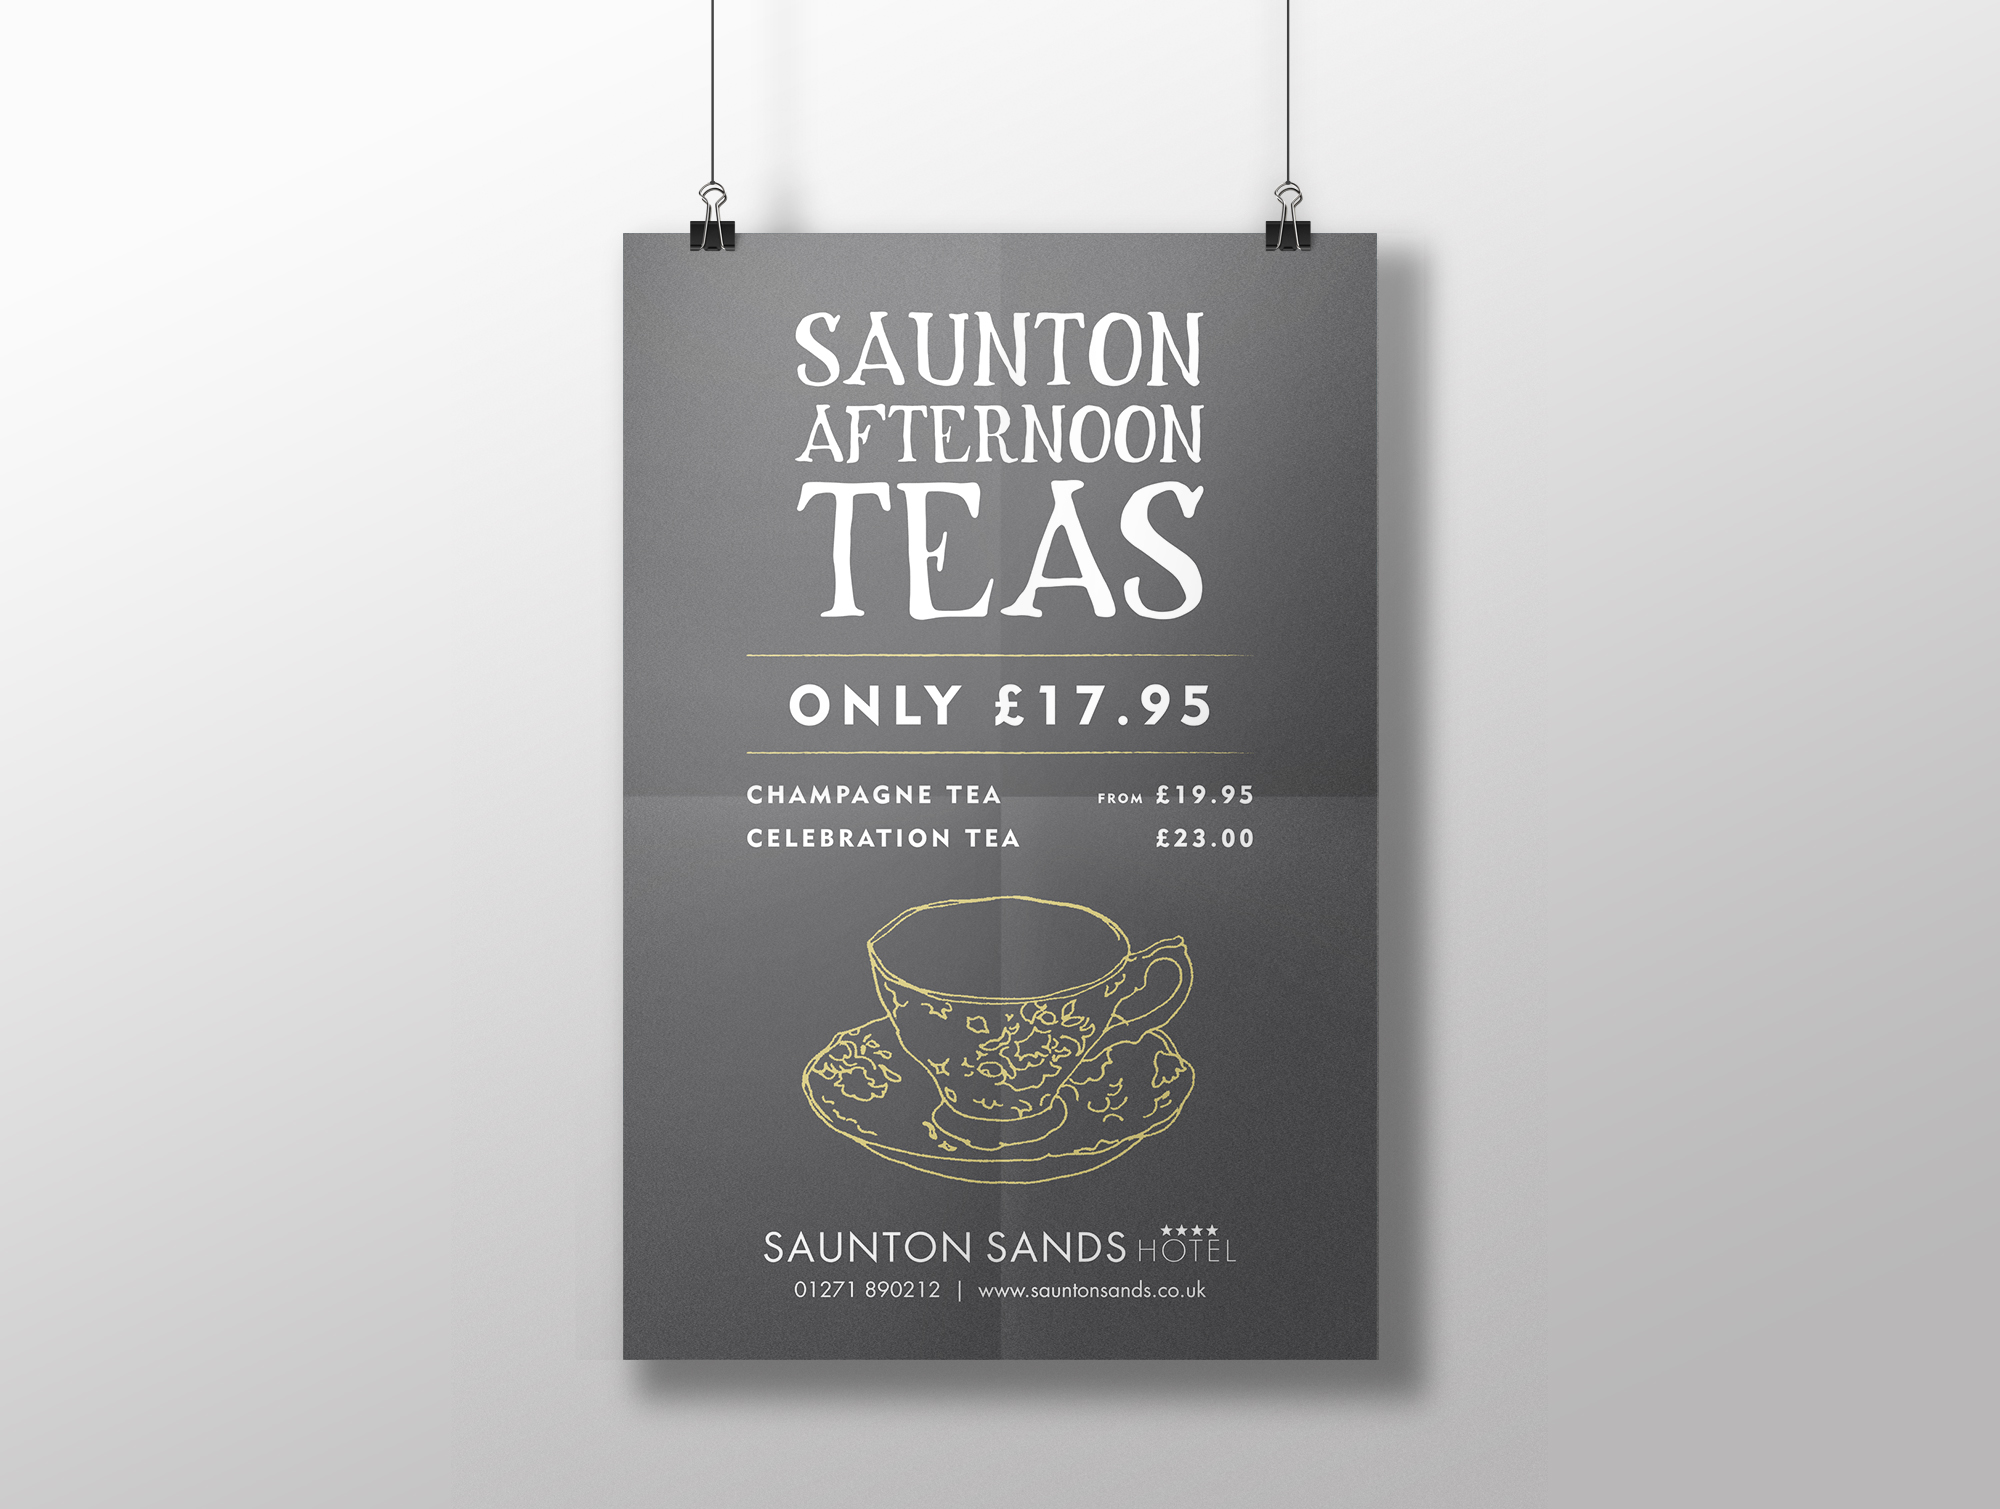 Saunton Poster - Afternoon Tea 2.jpg